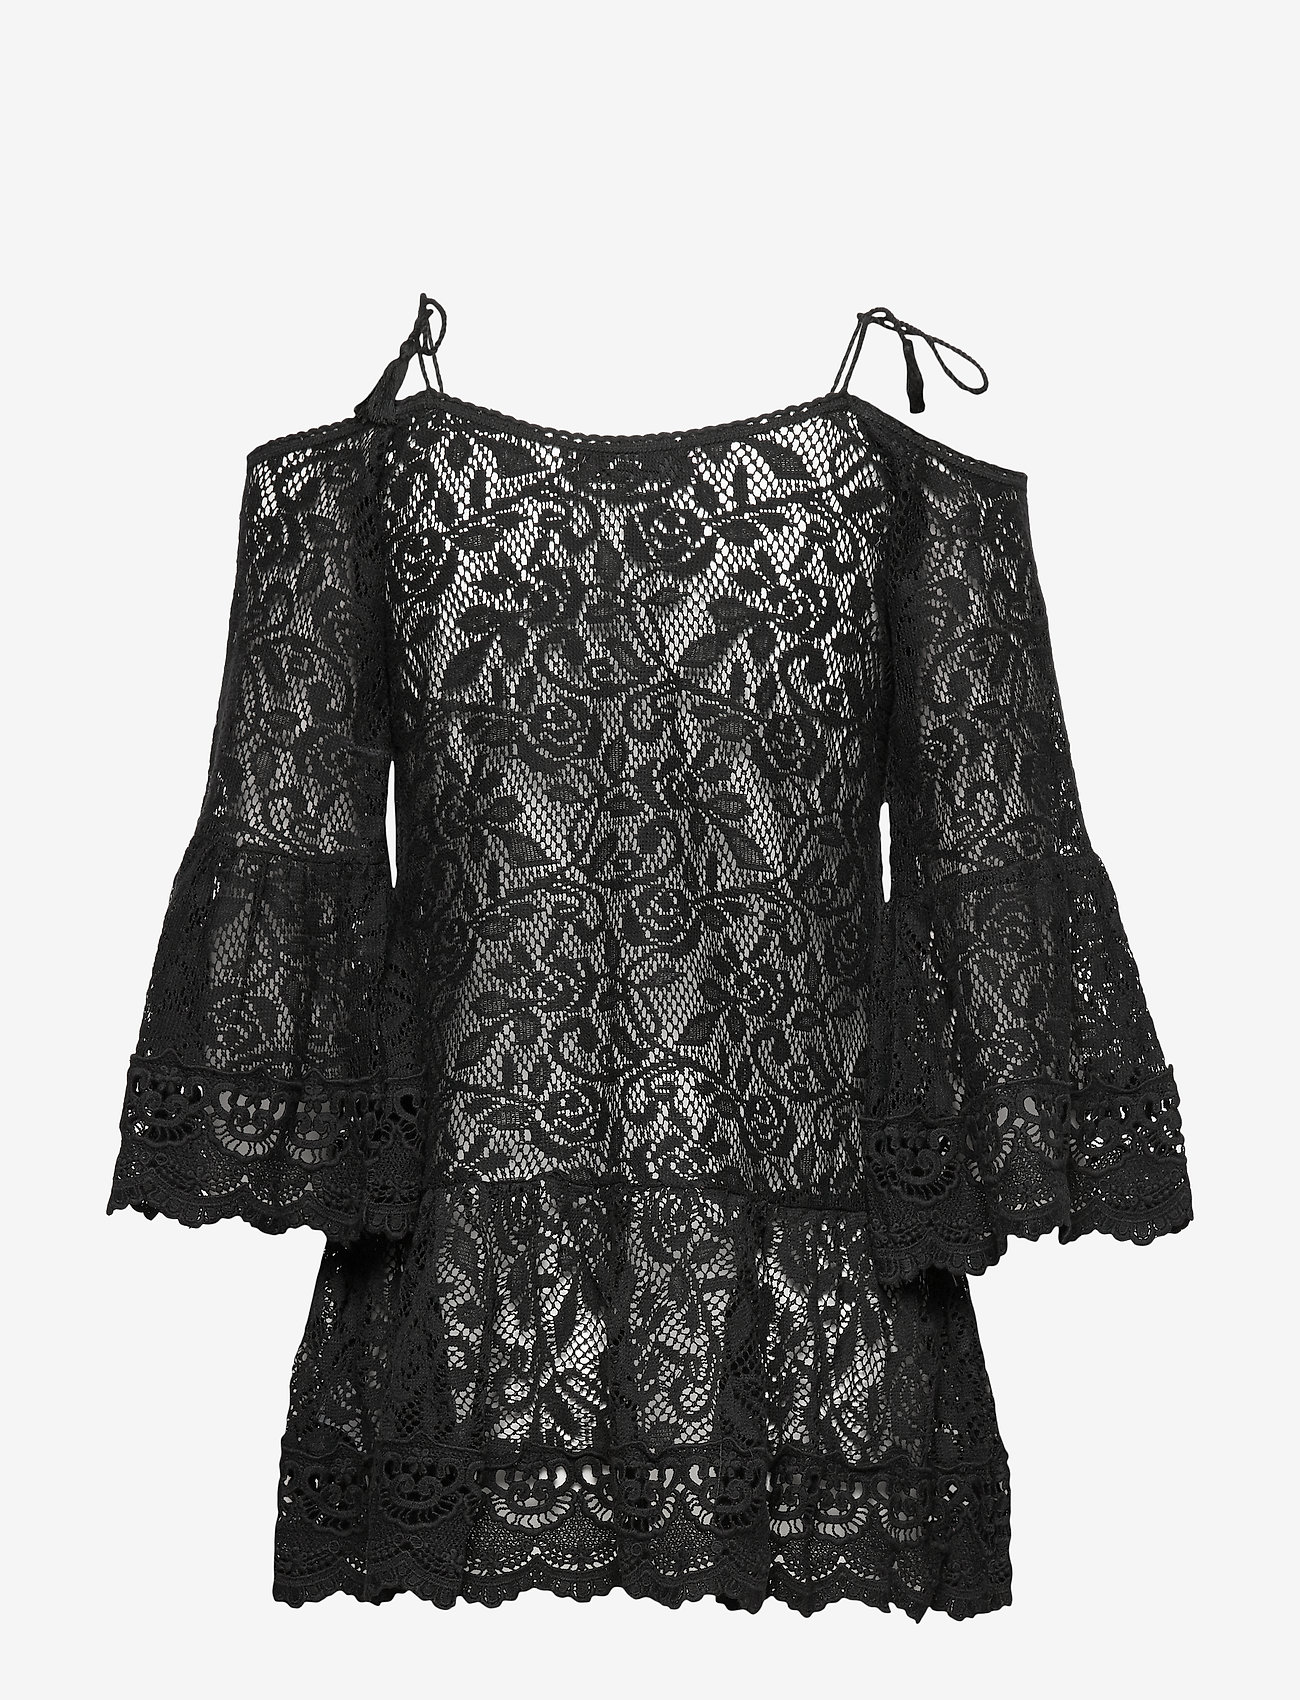 Allover Lace Tunic (Black) (434.25 kr) - Hunkemöller